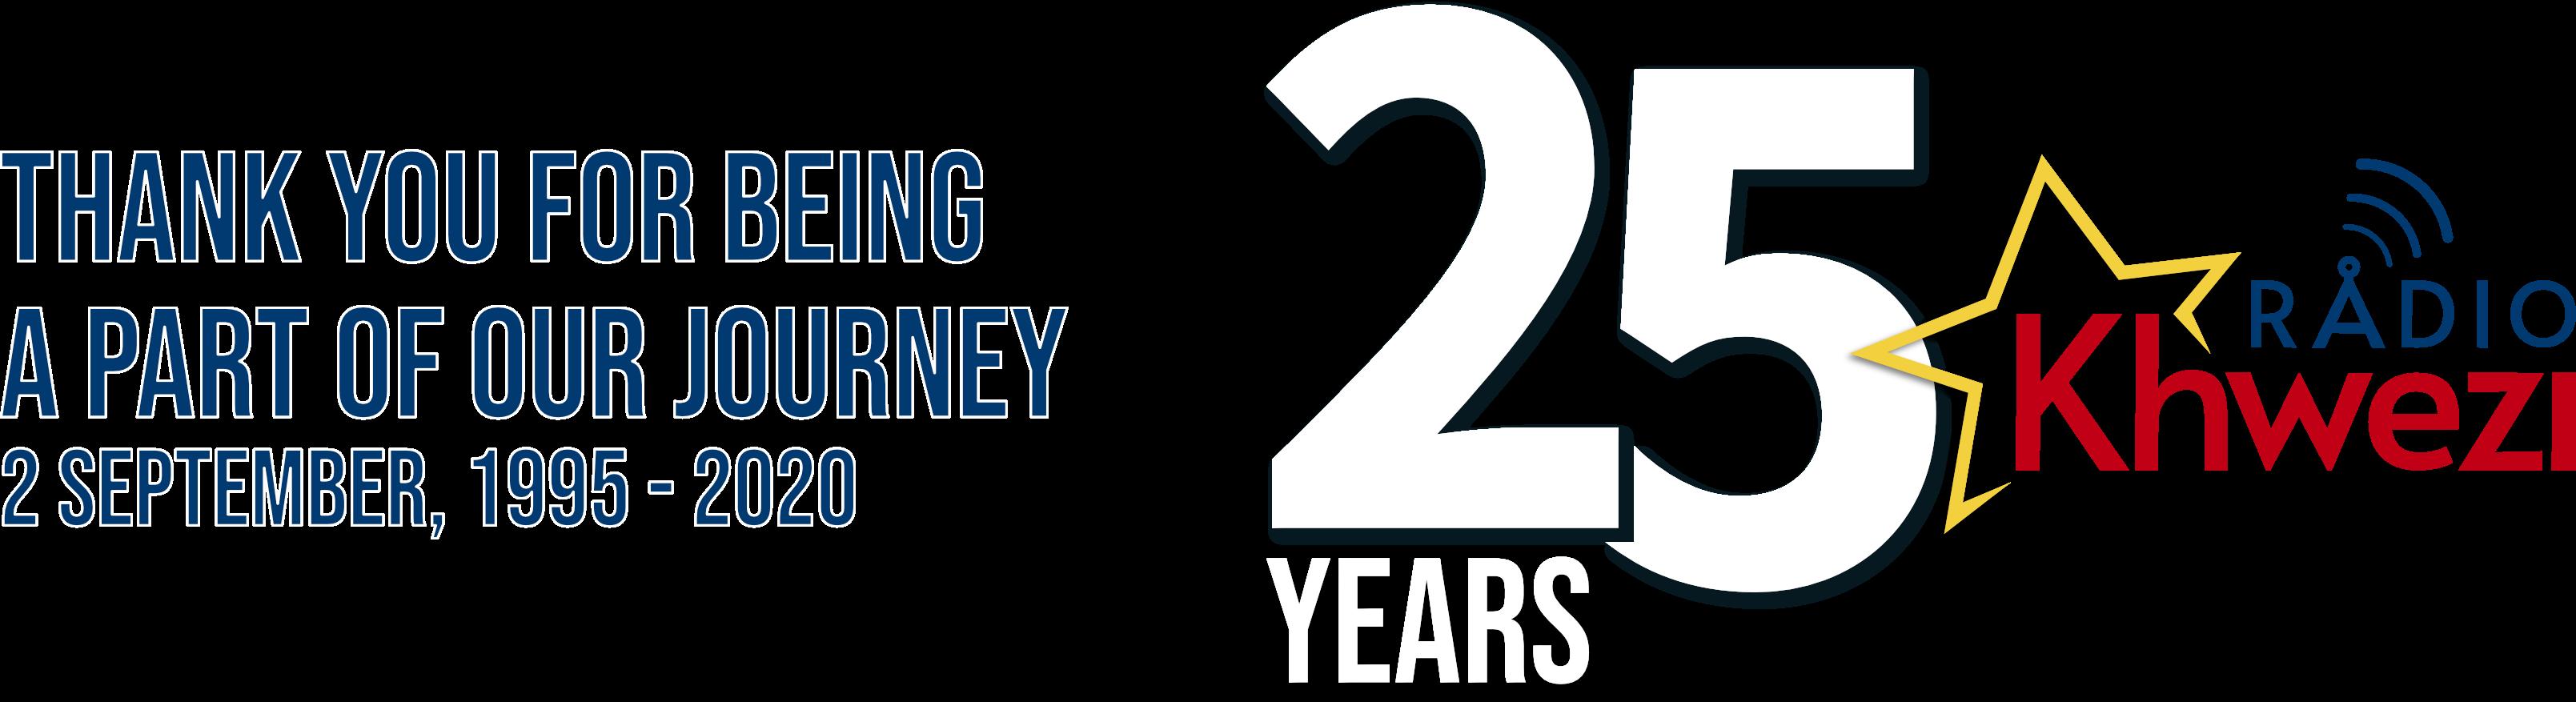 Radio Khwezi Logo 2020_25 years